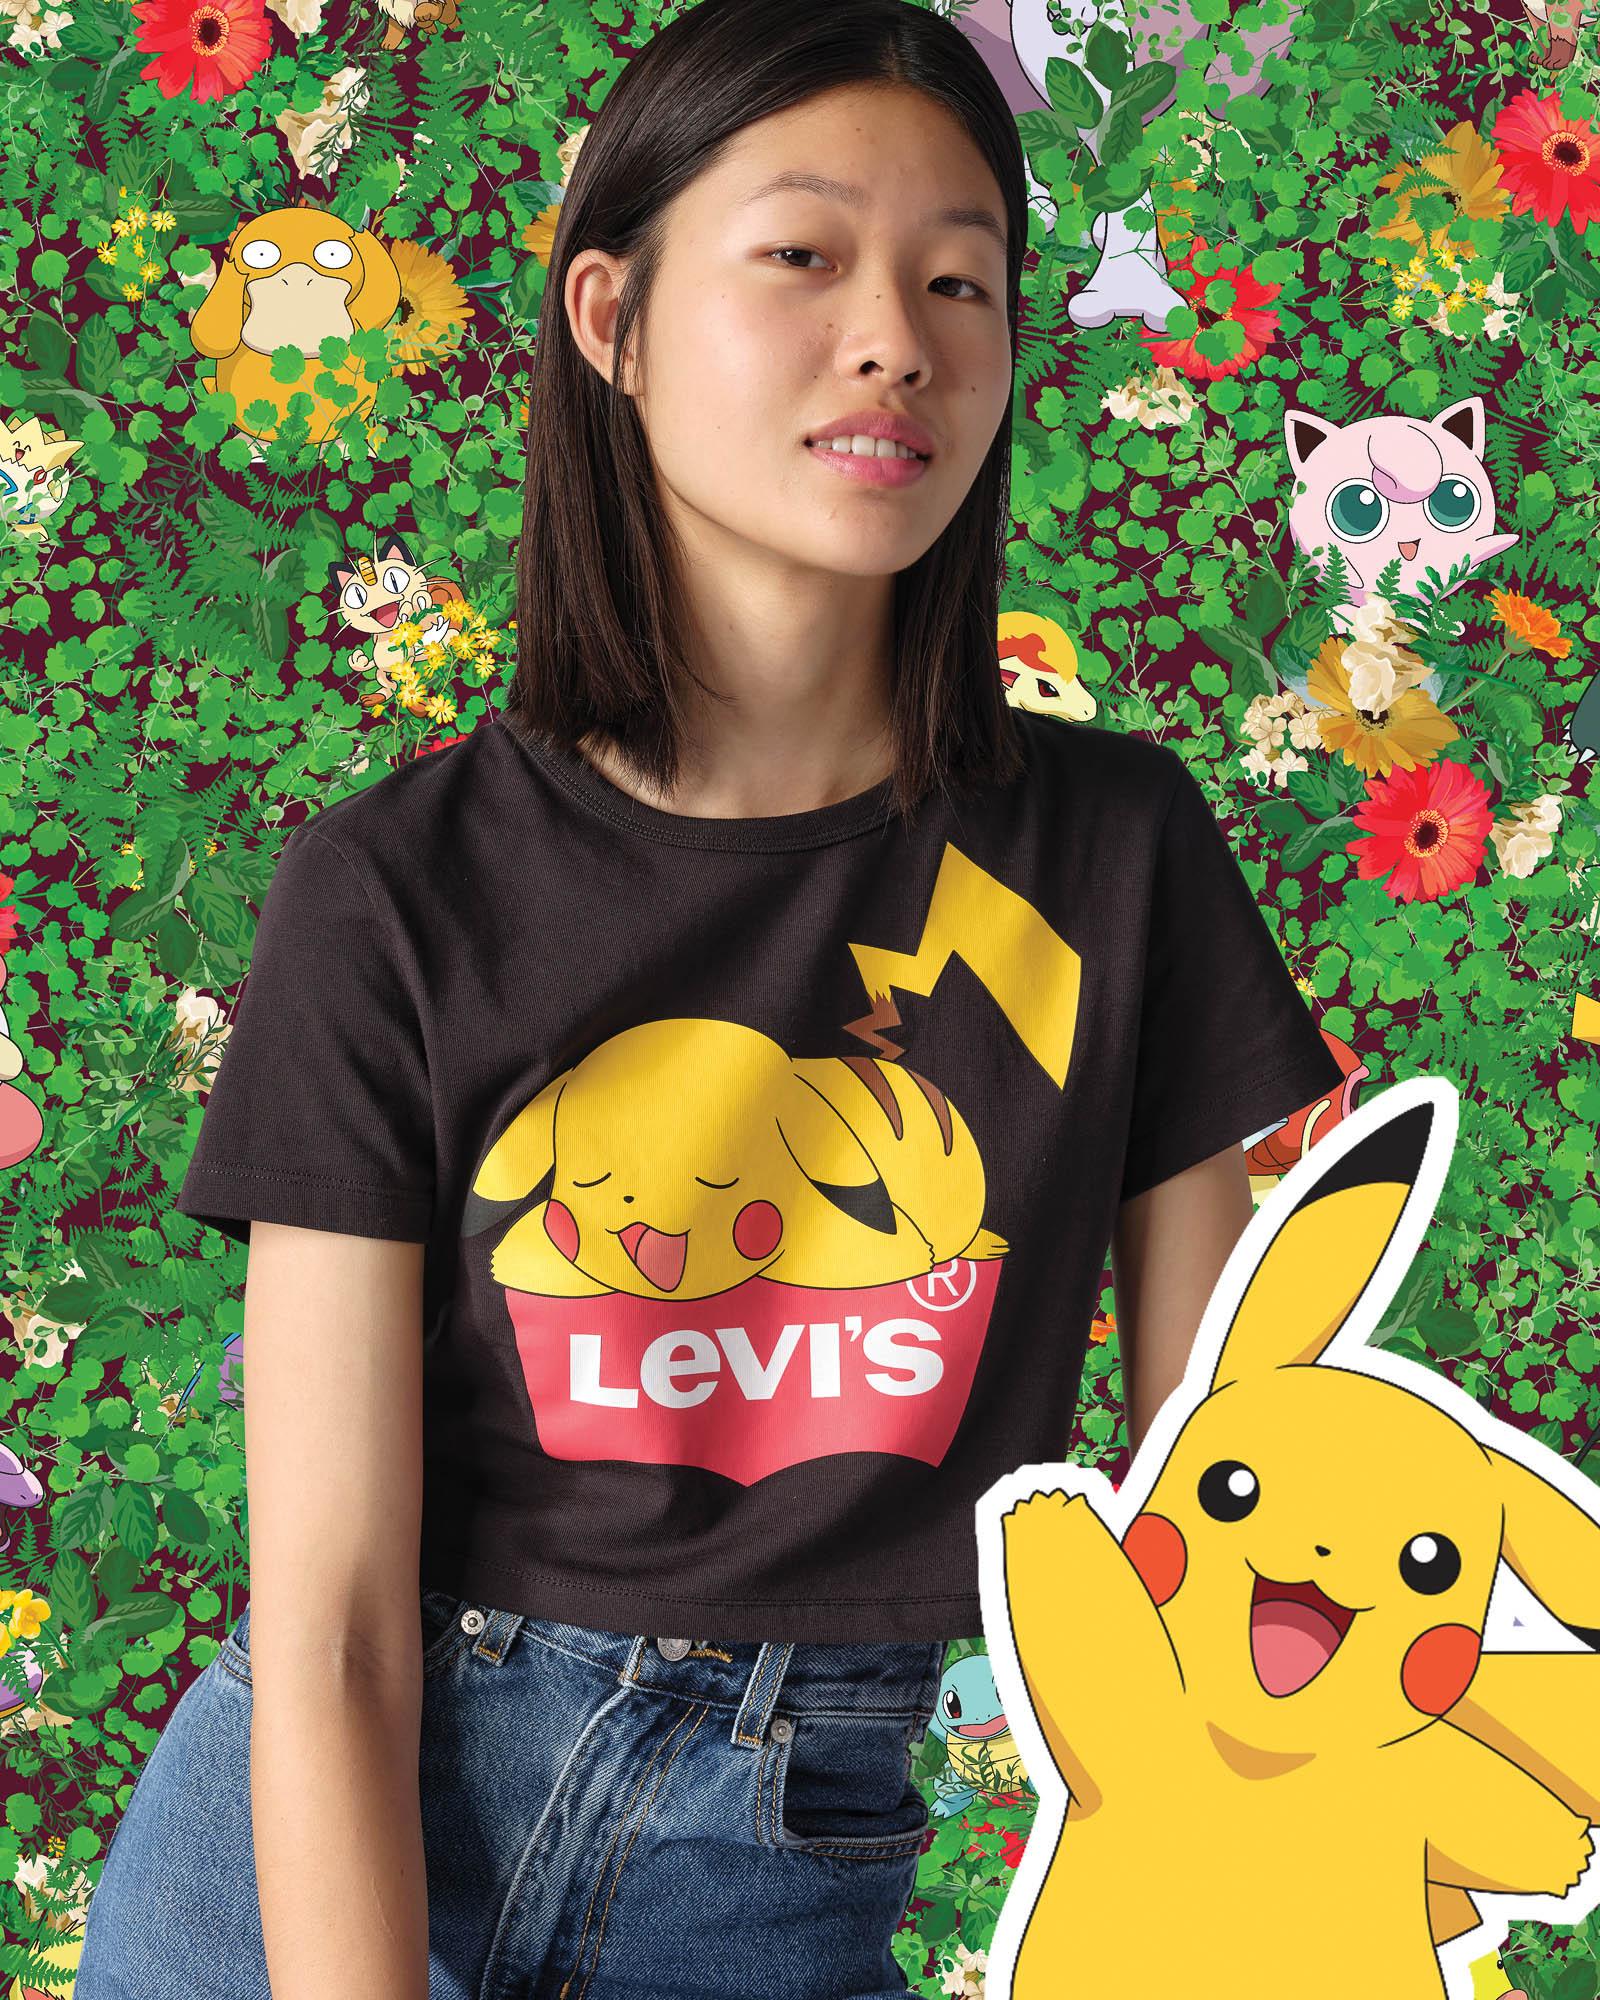 21_H1_Pokemon_W_101_Sleeping-Pikachu-Crop_12_CMYK